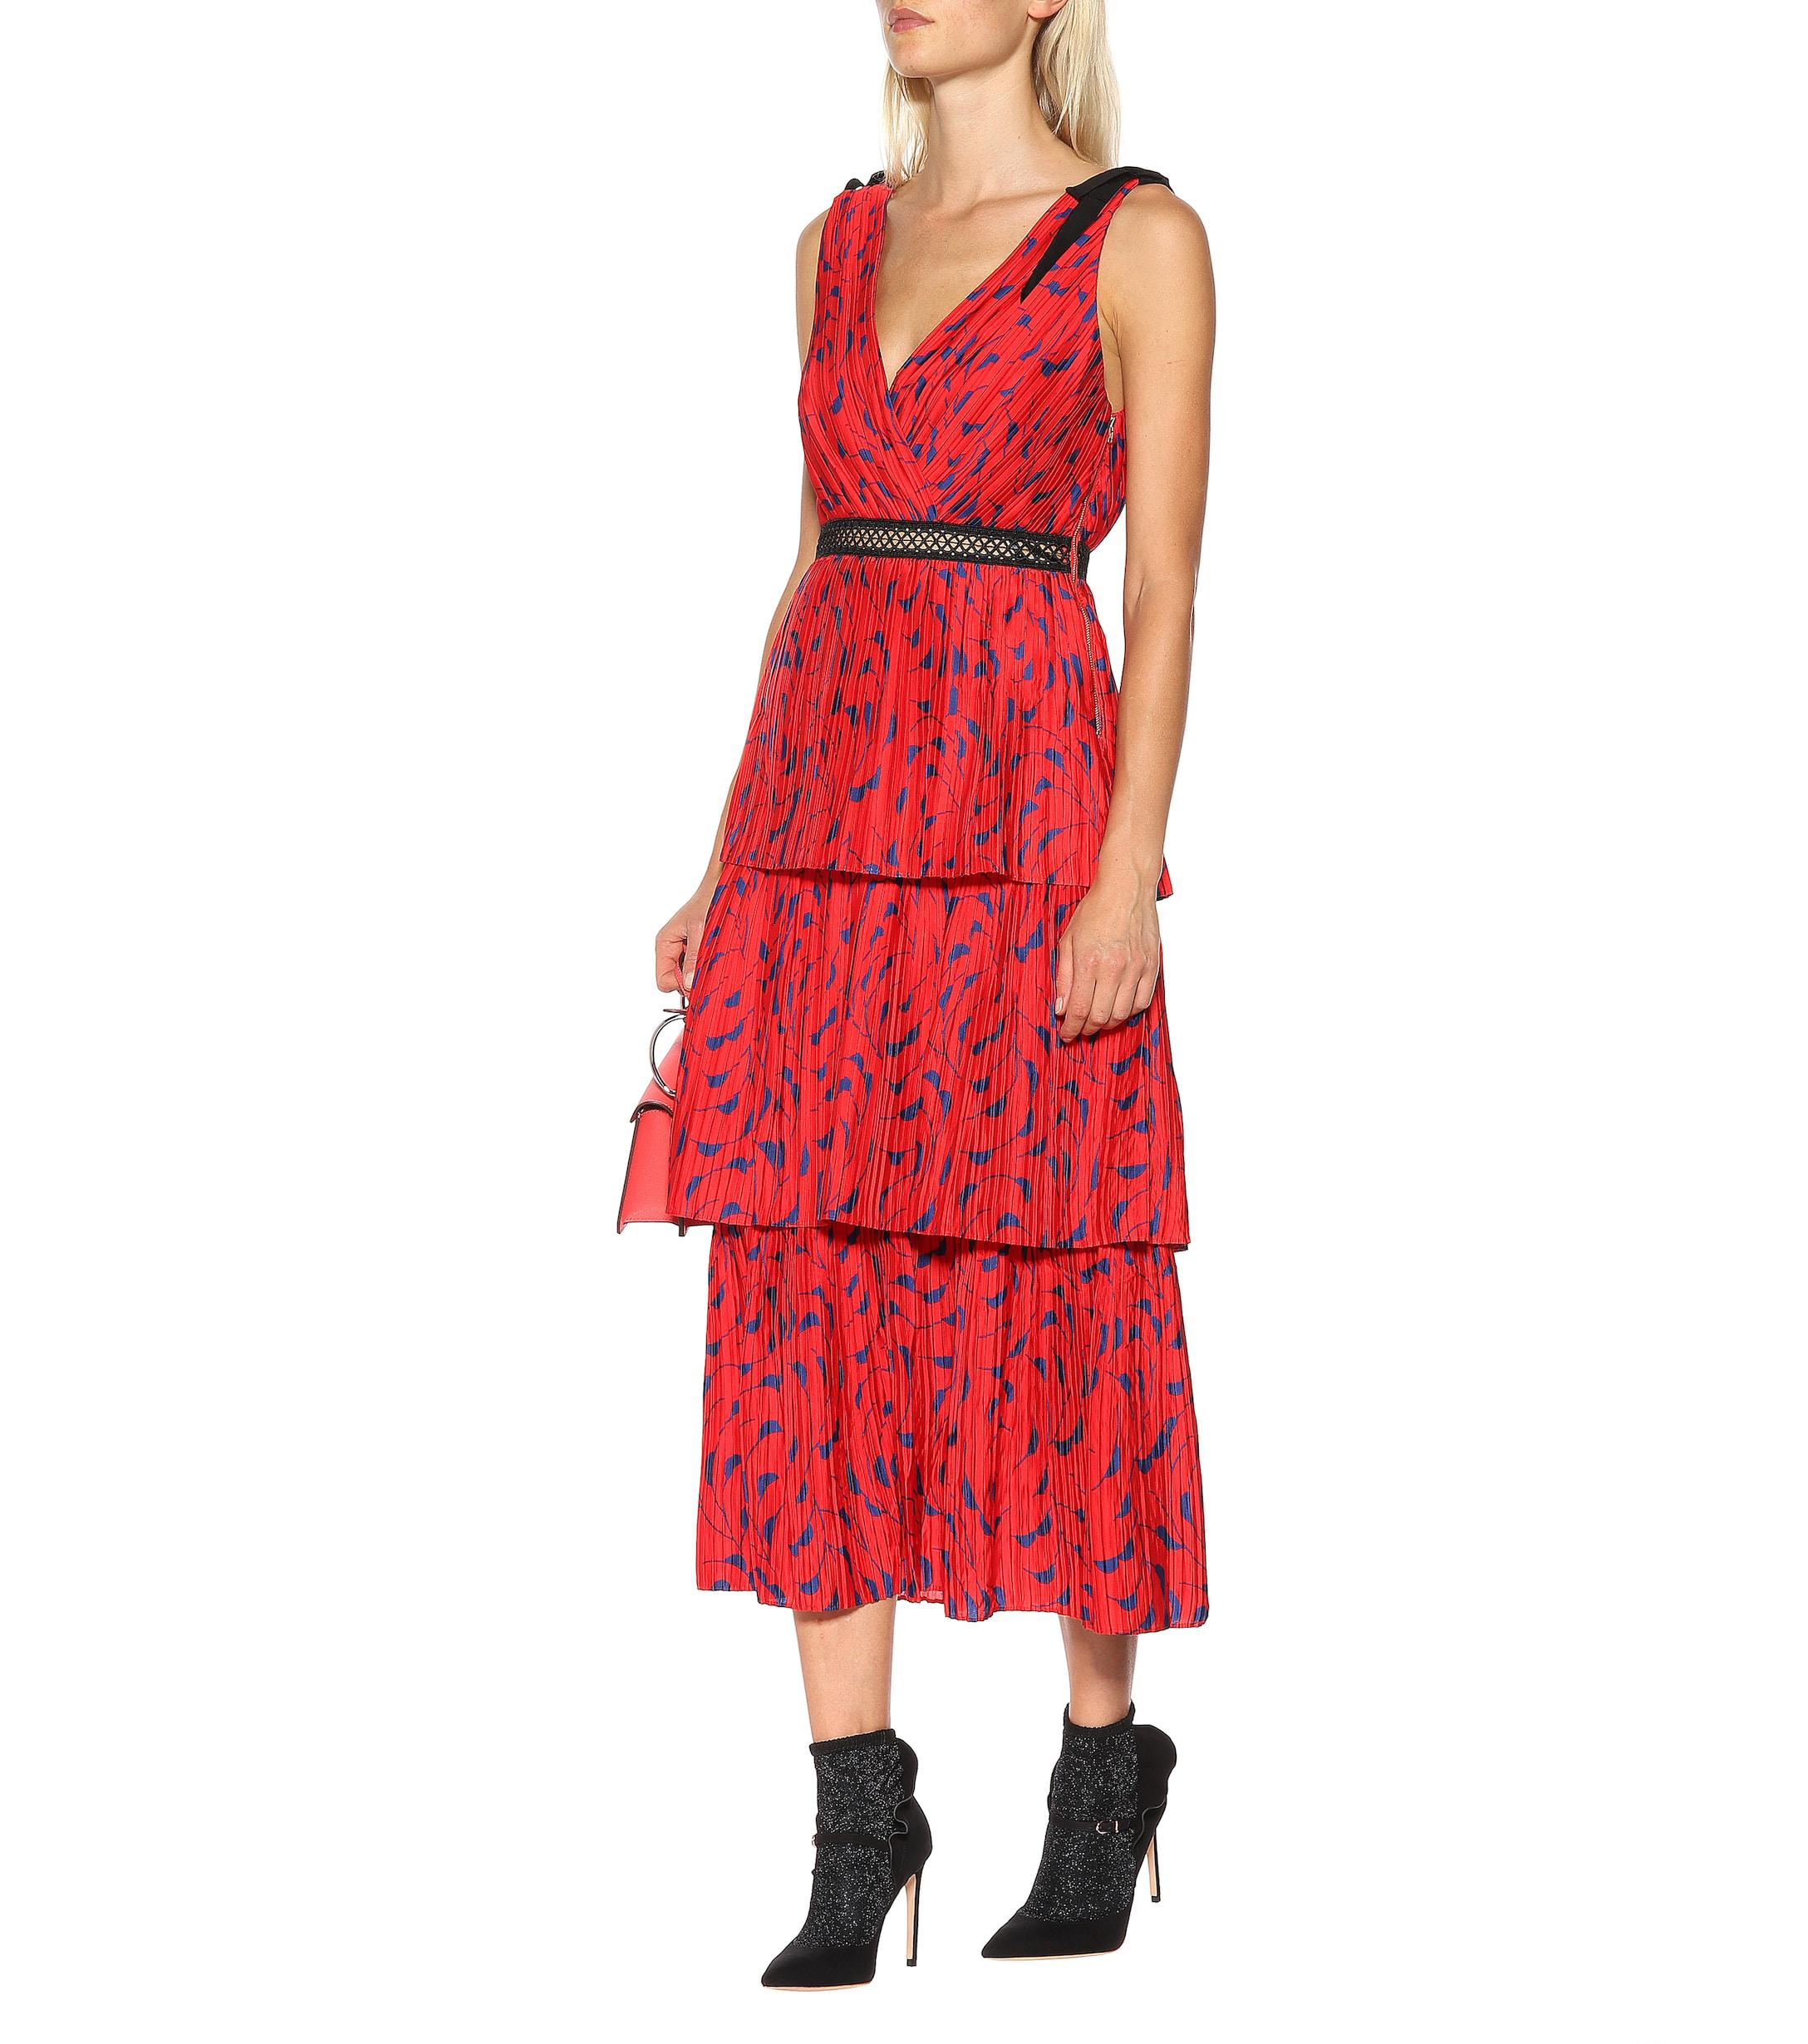 fcbfb2643edf Self-Portrait - Red Printed Satin Midi Dress - Lyst. View fullscreen